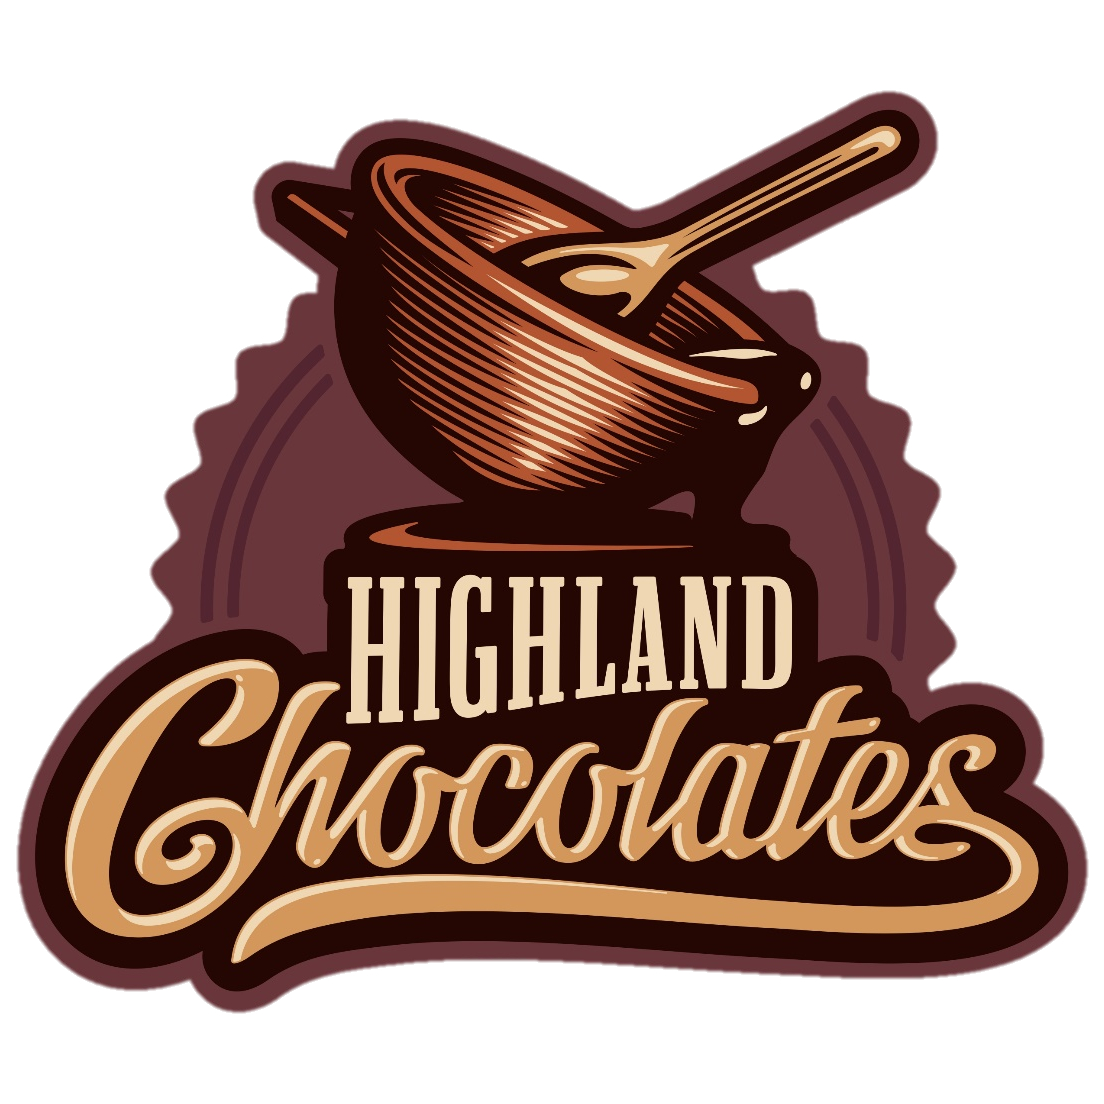 Highland Chocolates